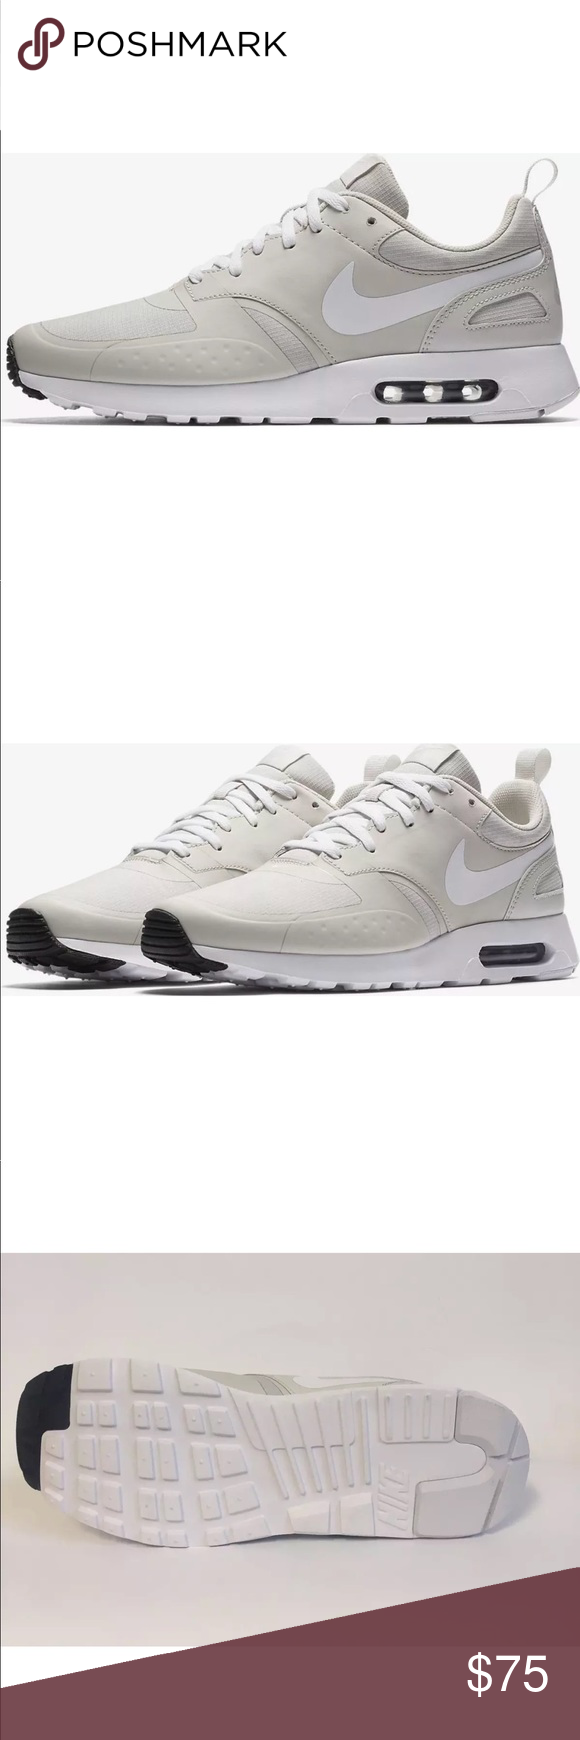 3fce28befdb4 NEW Men s 11 Nike Air Max Vision Grey Bone Beige New in Box Authentic Men s  11 Nike Air Max Vision Grey Light Bone White Beige 100% Authentic